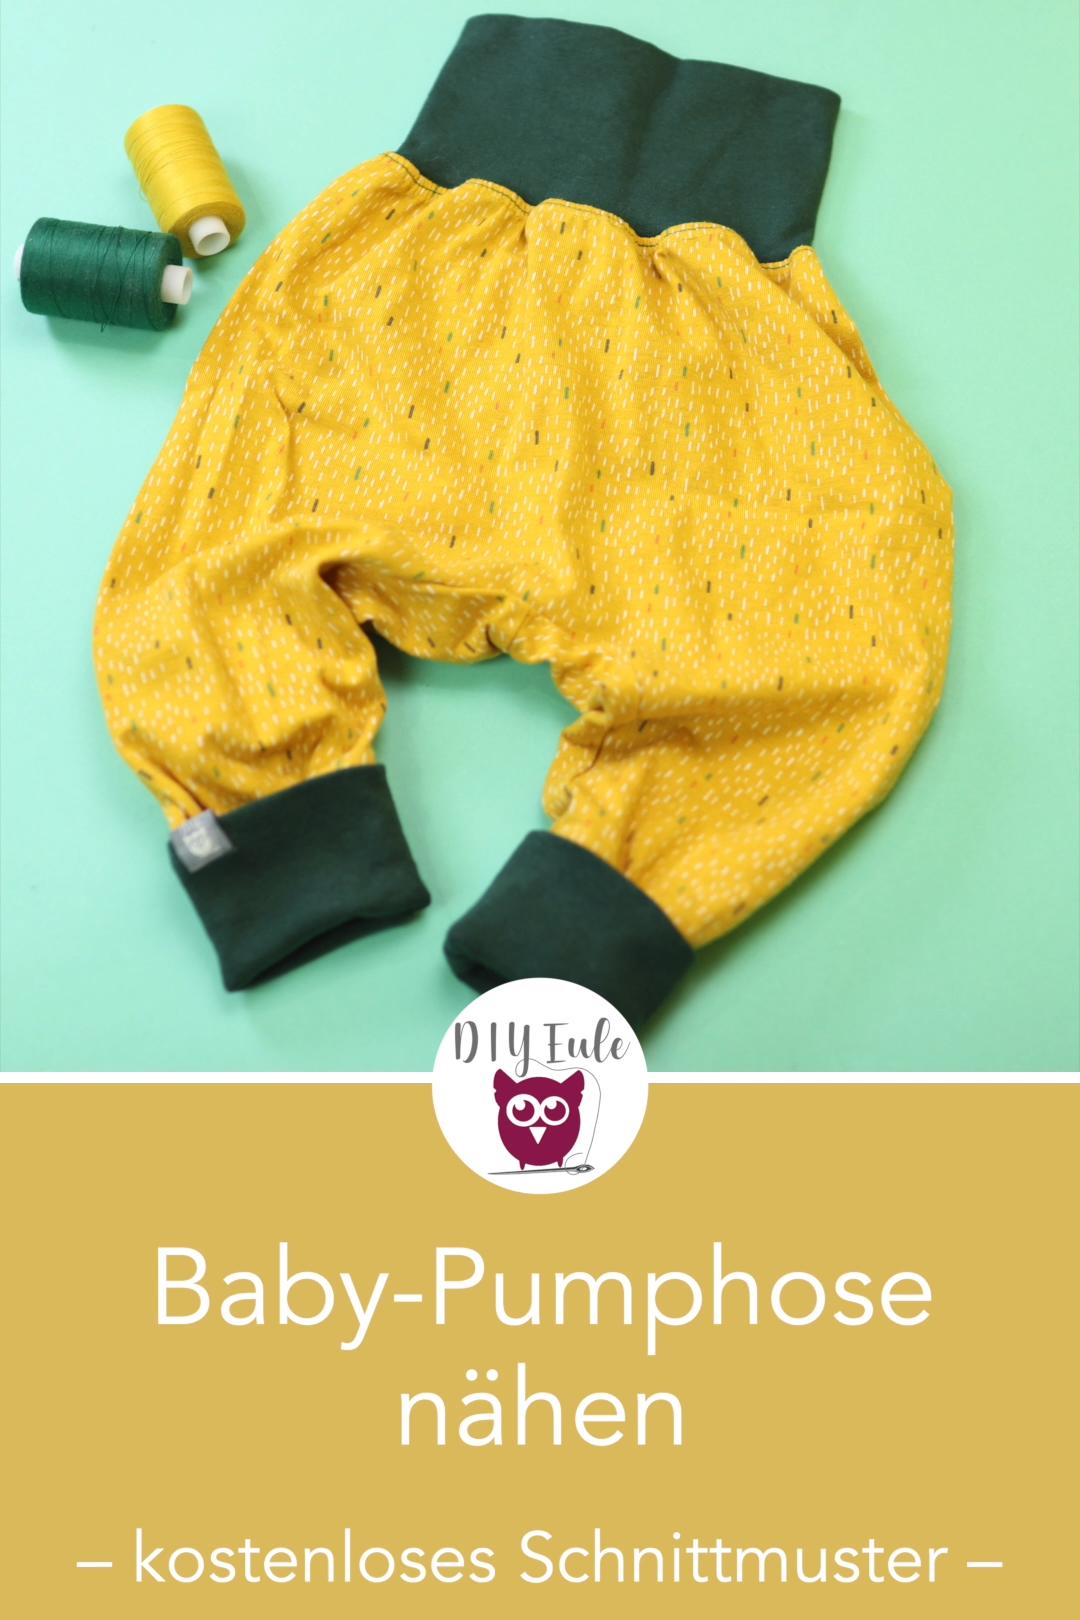 Pumphose für Babys nähen